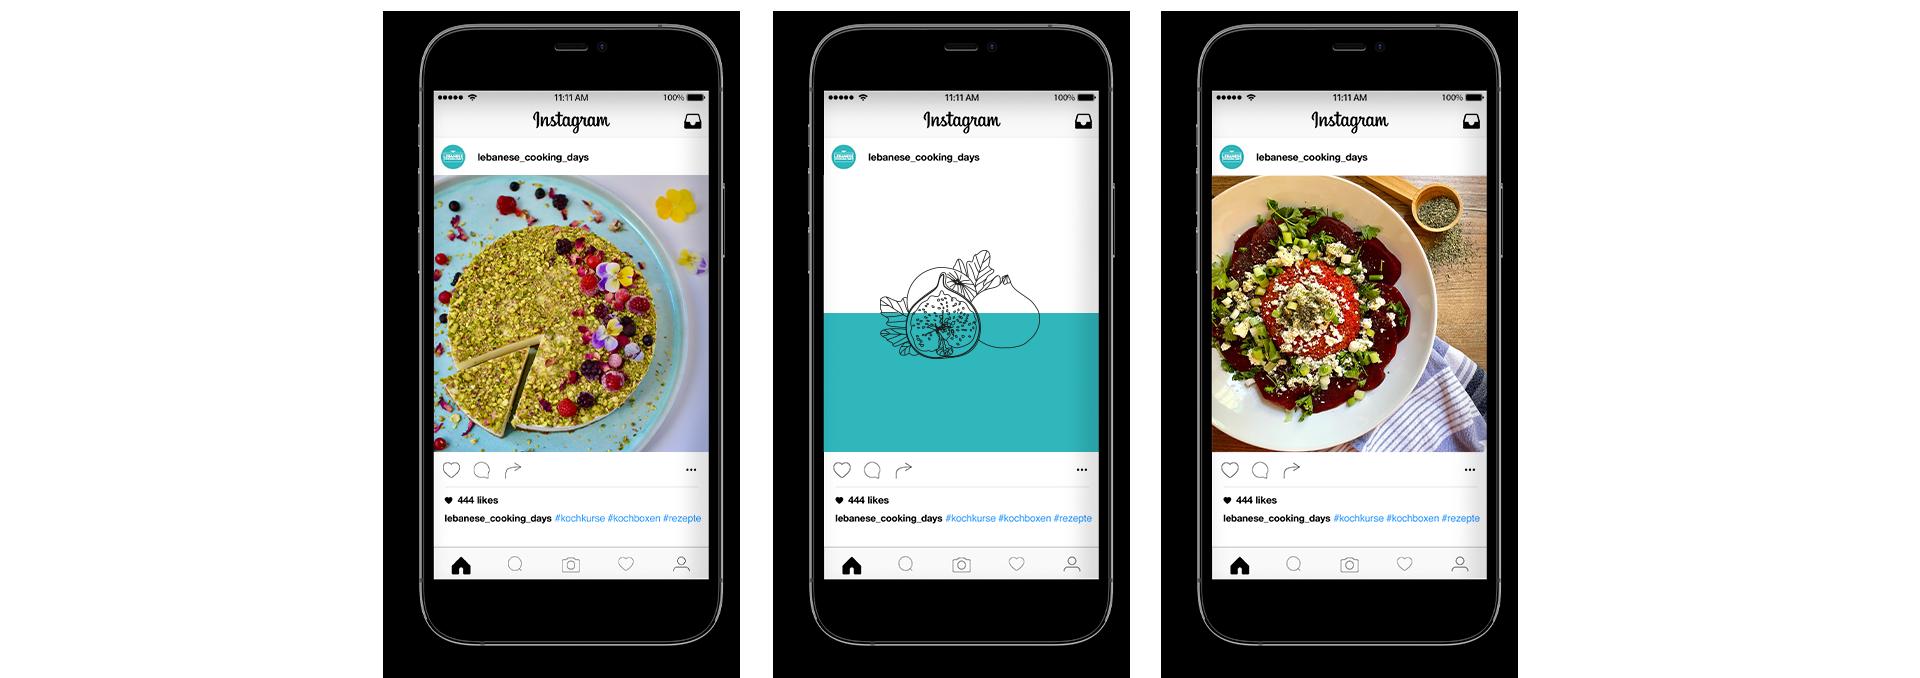 Social Media Feed Design Lebanese Cooking Days